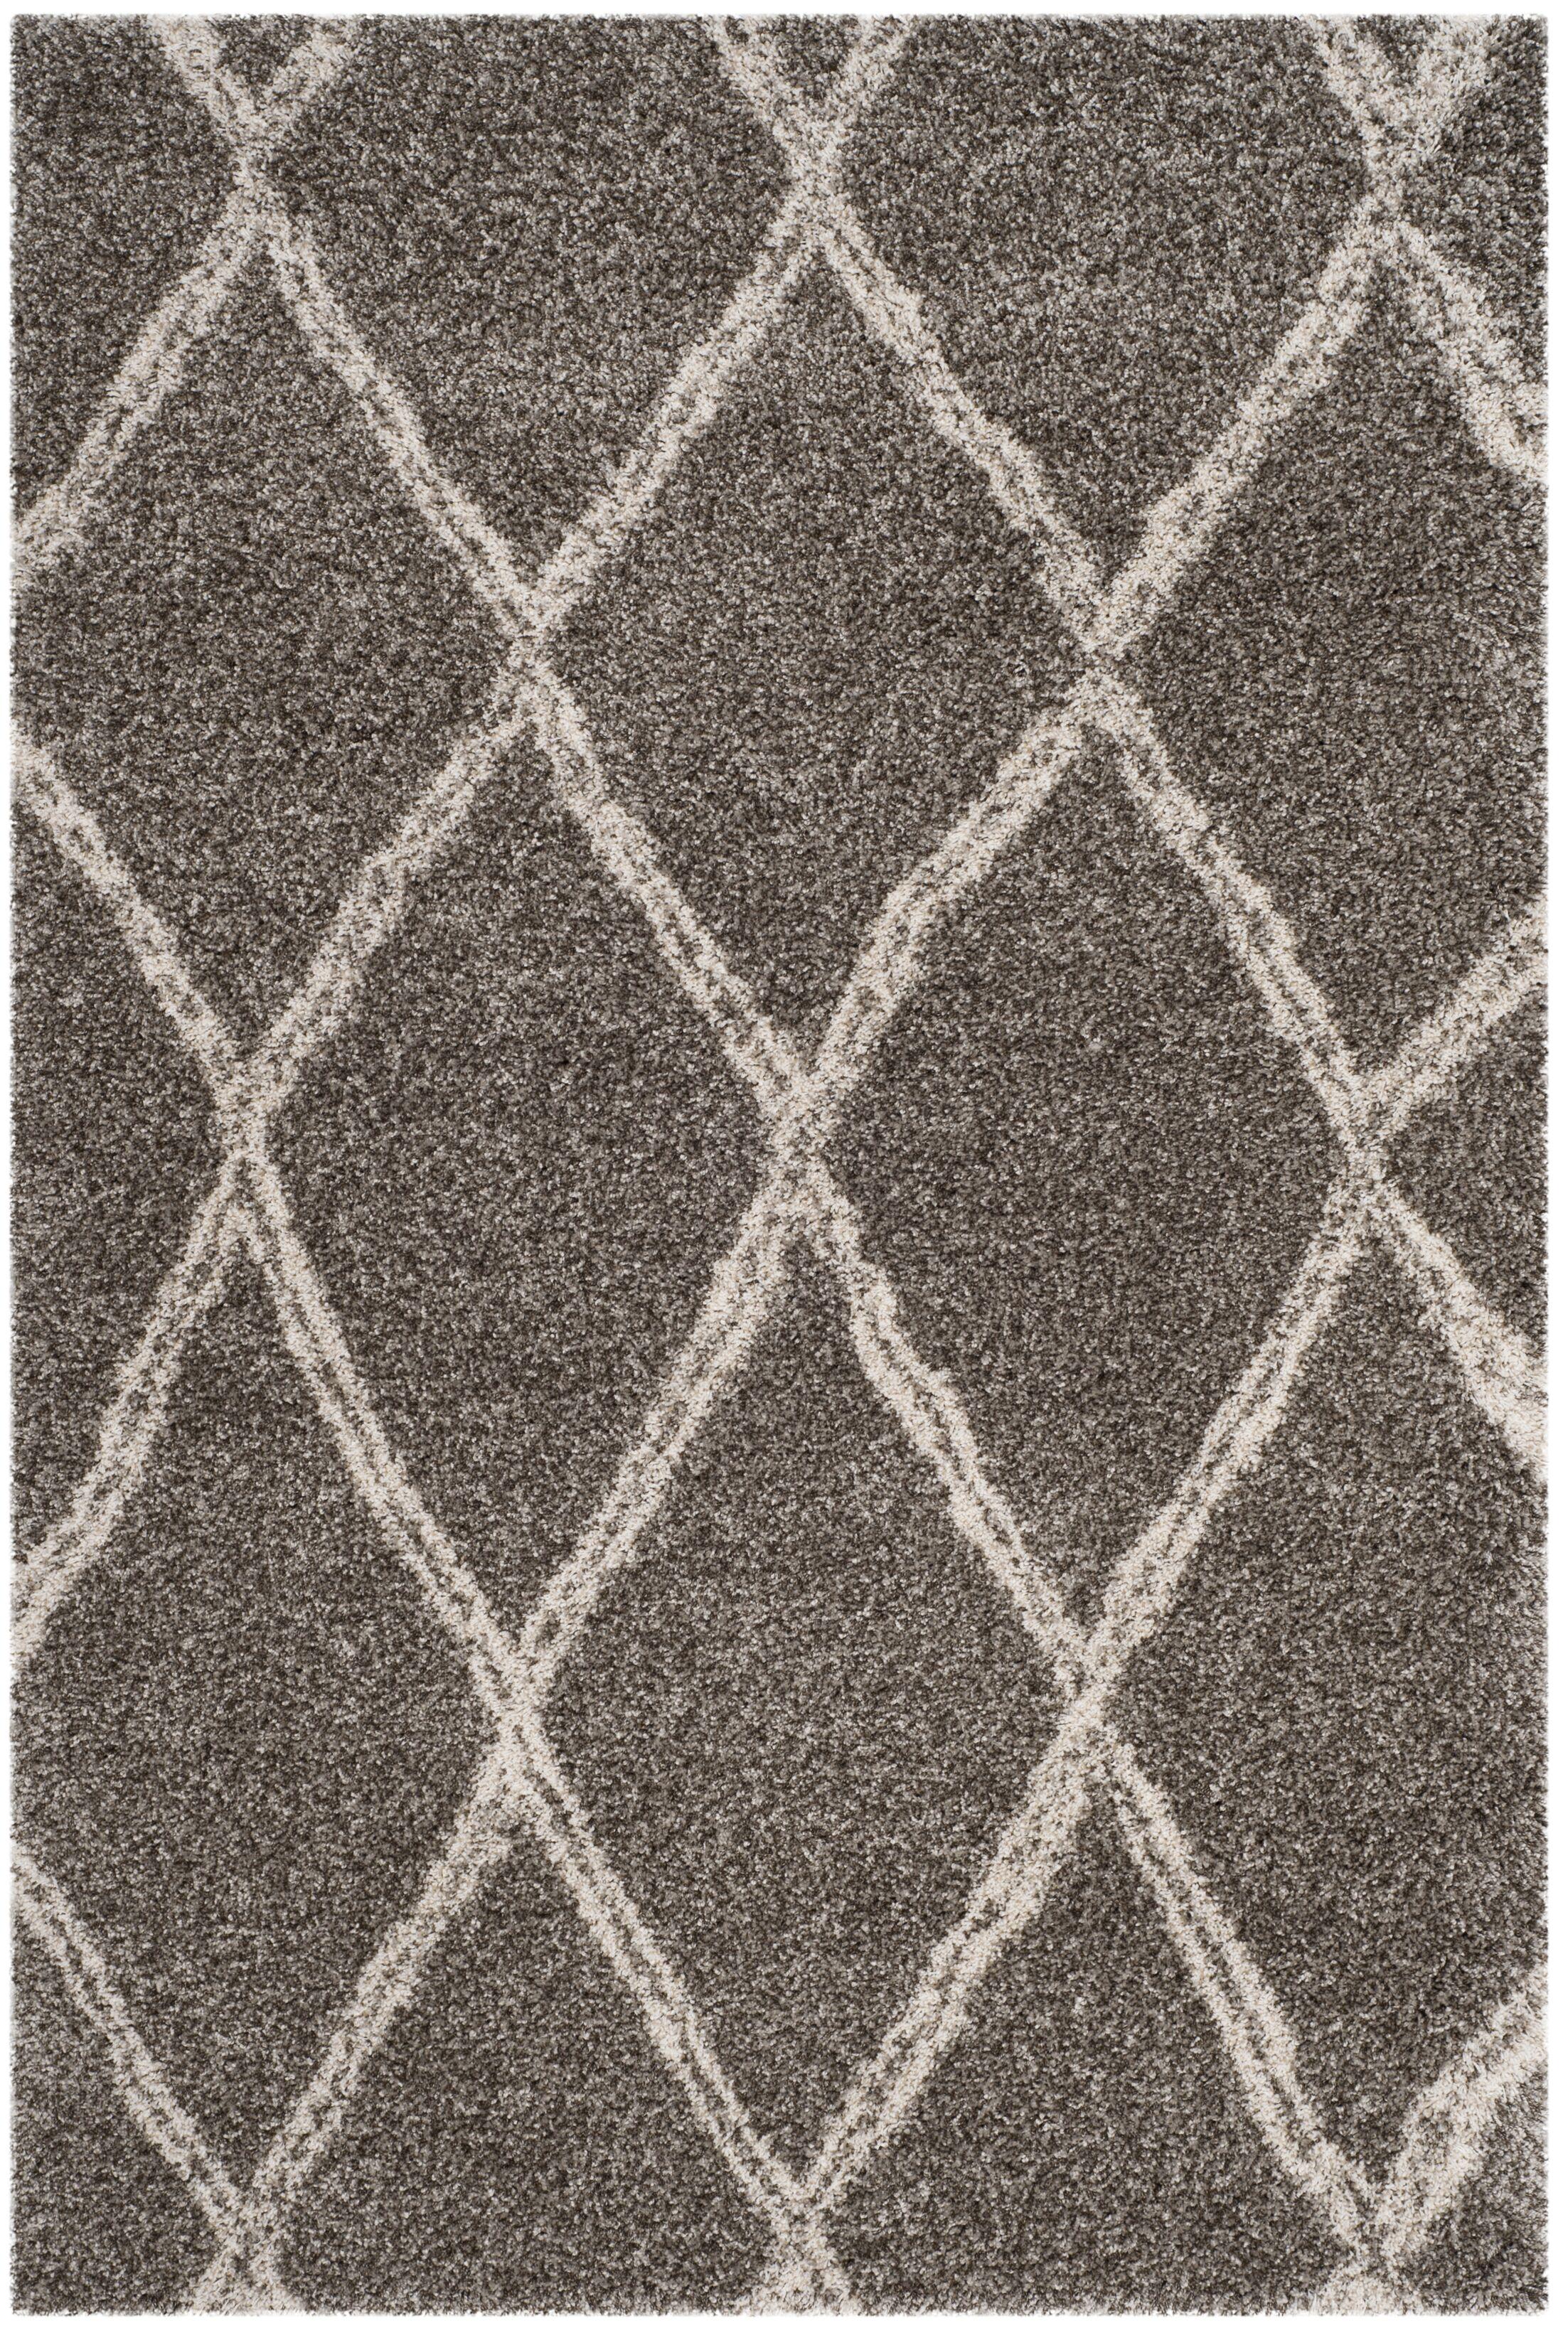 Elizabeth Street Gray/Ivory Area Rug Rug Size: Rectangle 5'1